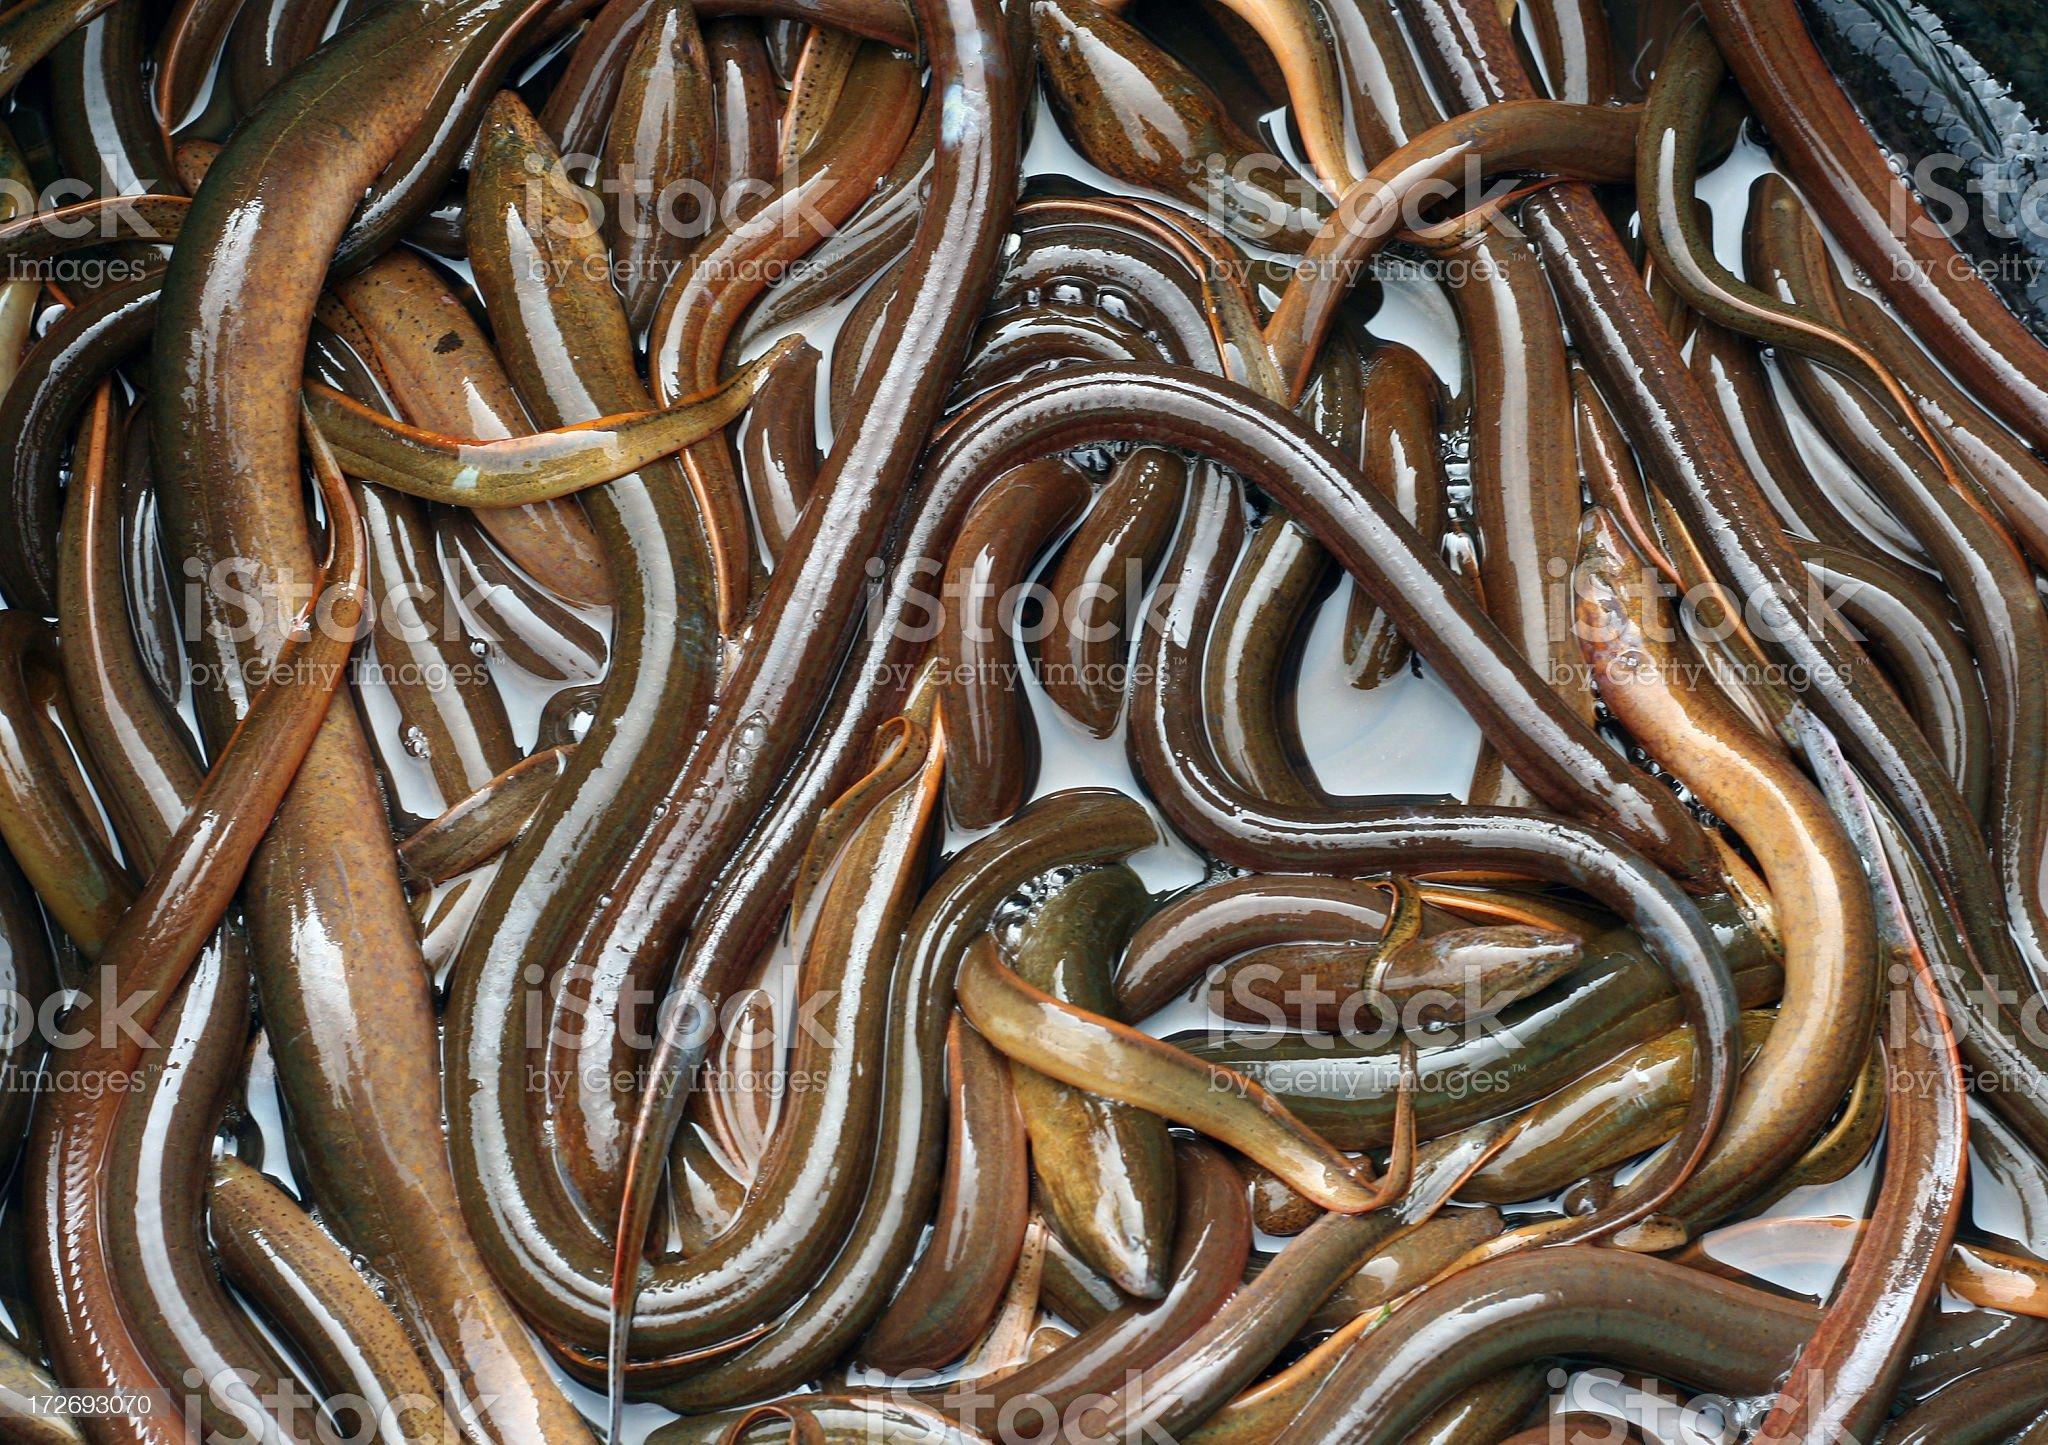 eels royalty-free stock photo